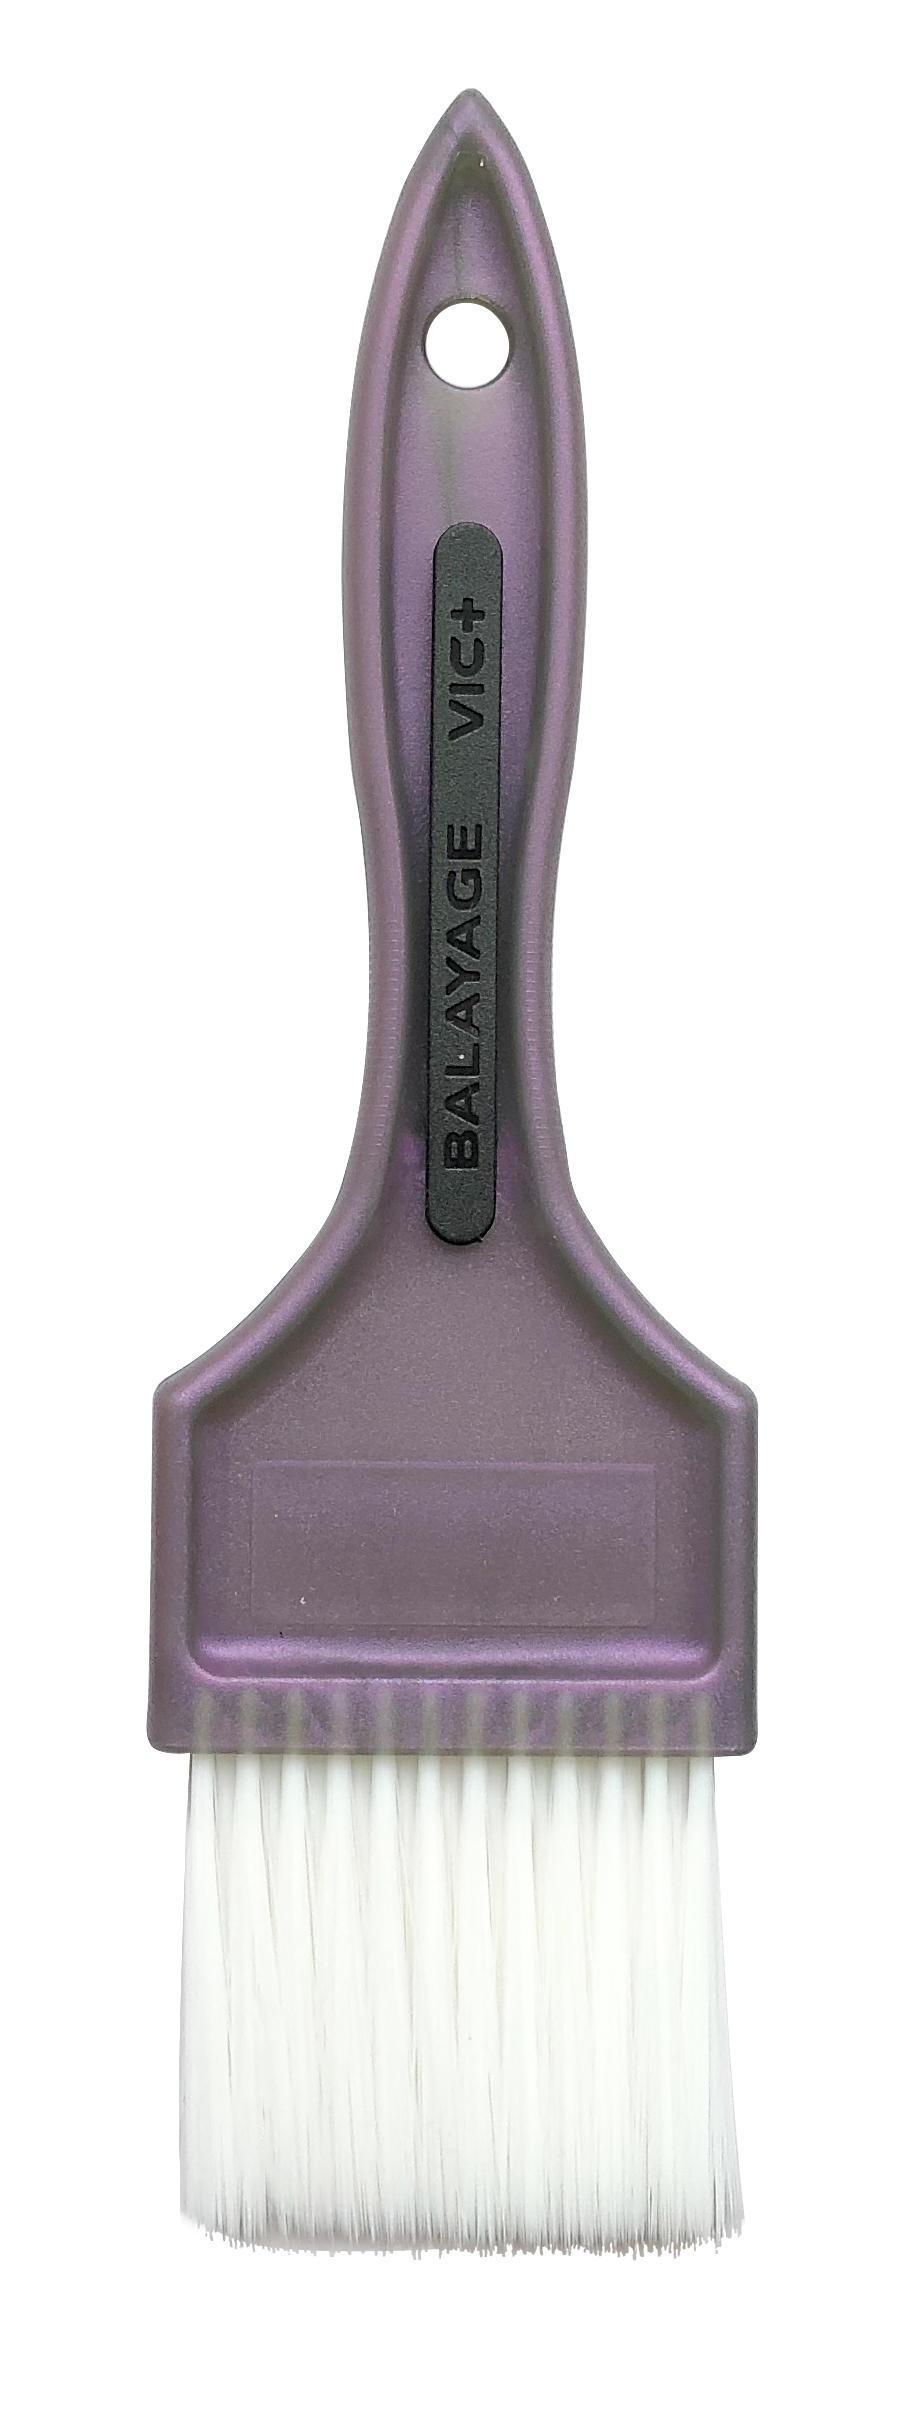 Wholesale Reusable 2 pcs Hair Salon Equipment Hair Coloring Dyeing Tinting Brush